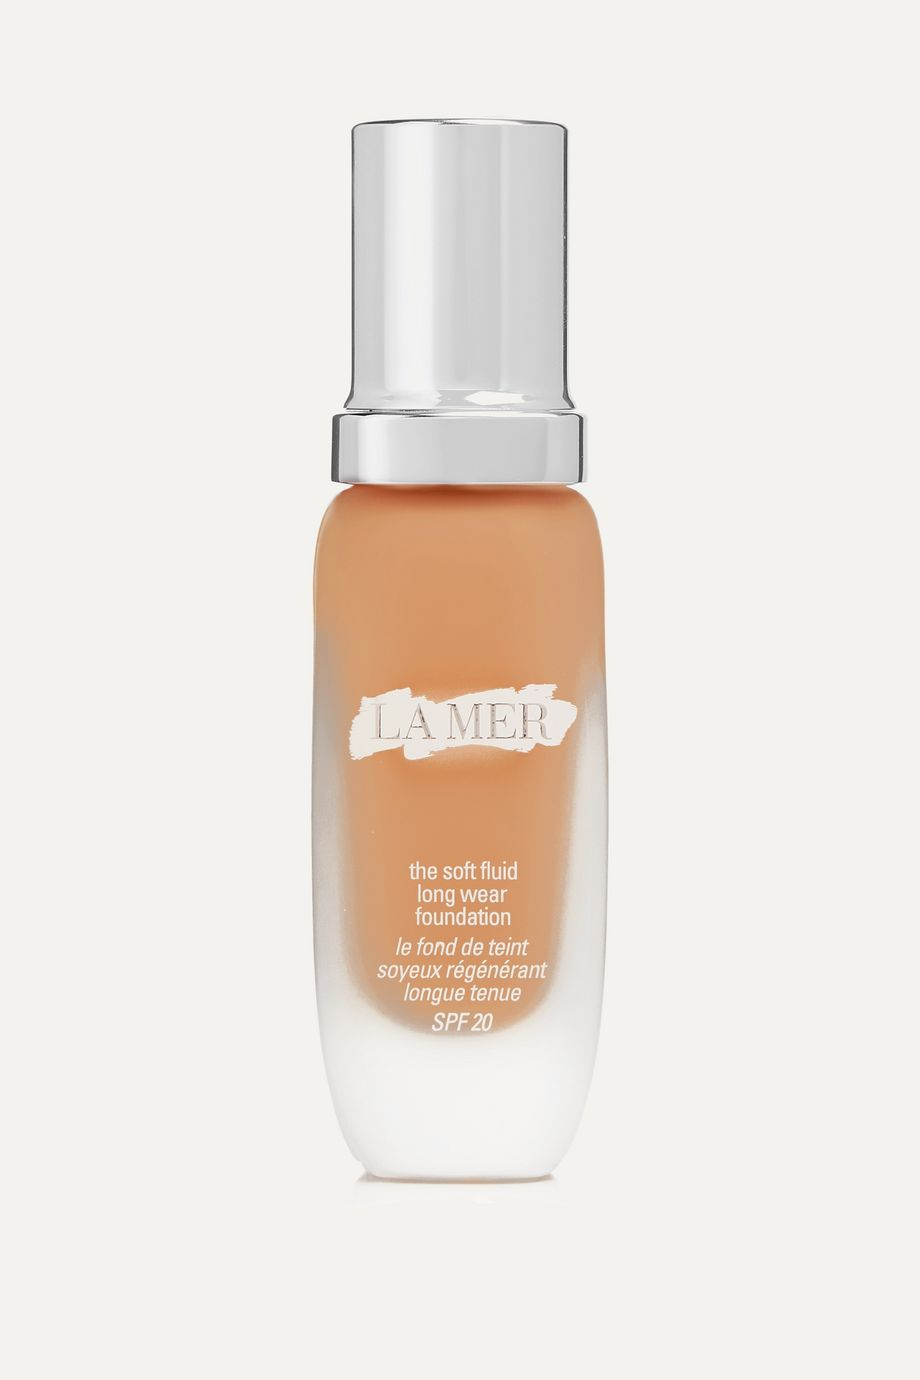 La Mer The Soft Fluid Long Wear Foundation SPF20 - 440 Amber, 30ml